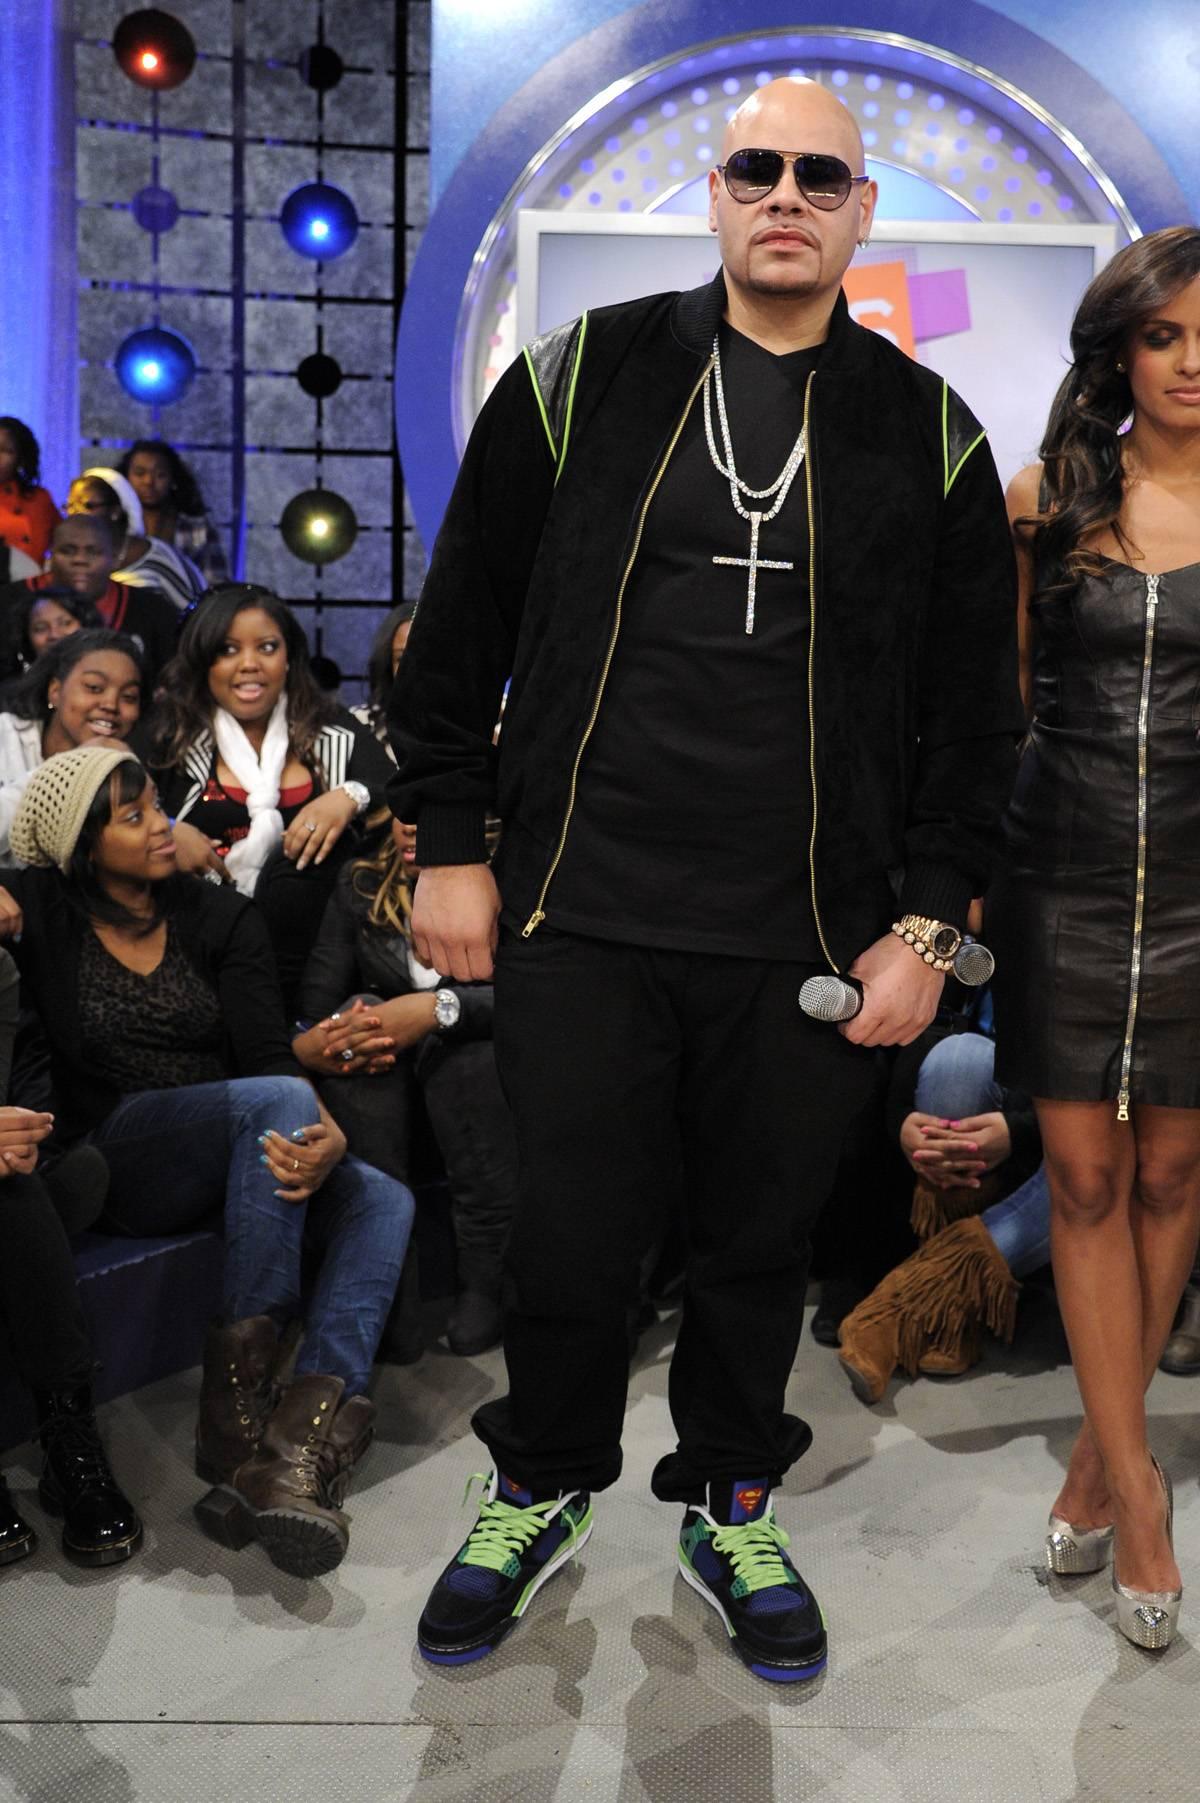 Check Me Now - Fat Joe at 106 & Park, January 3, 2012. (Photo: John Ricard / BET)